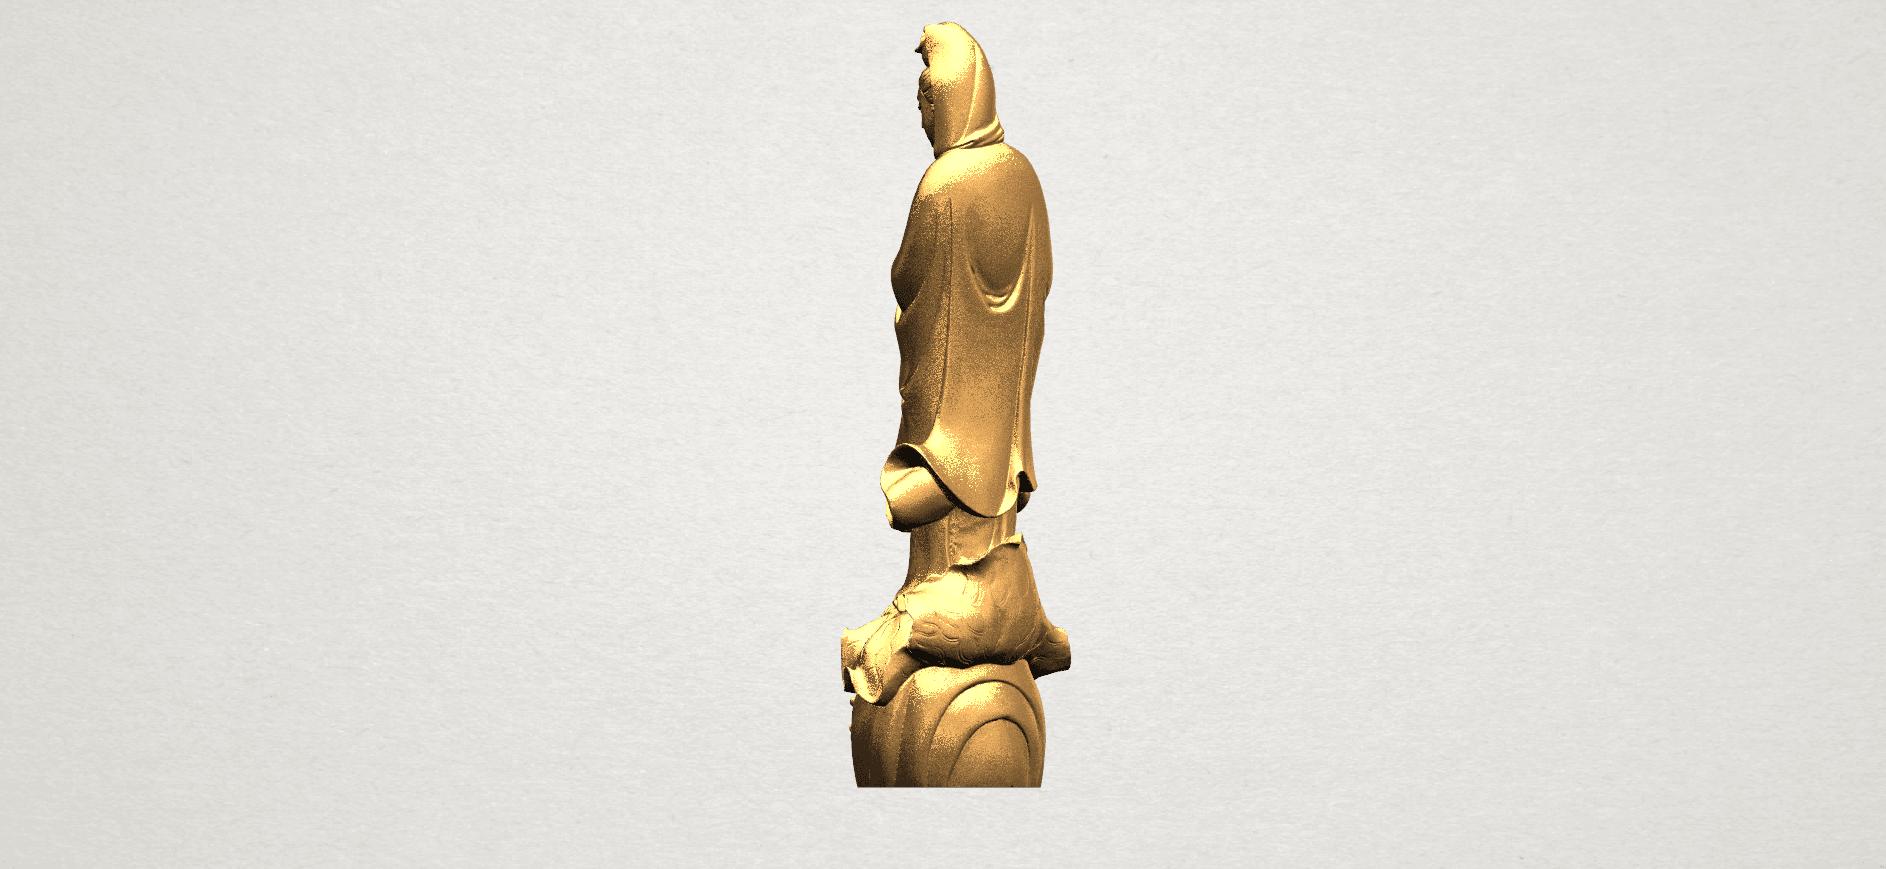 Avalokitesvara Buddha - Standing (i) A04.png Download free STL file Avalokitesvara Bodhisattva - Standing 01 • 3D printable design, GeorgesNikkei